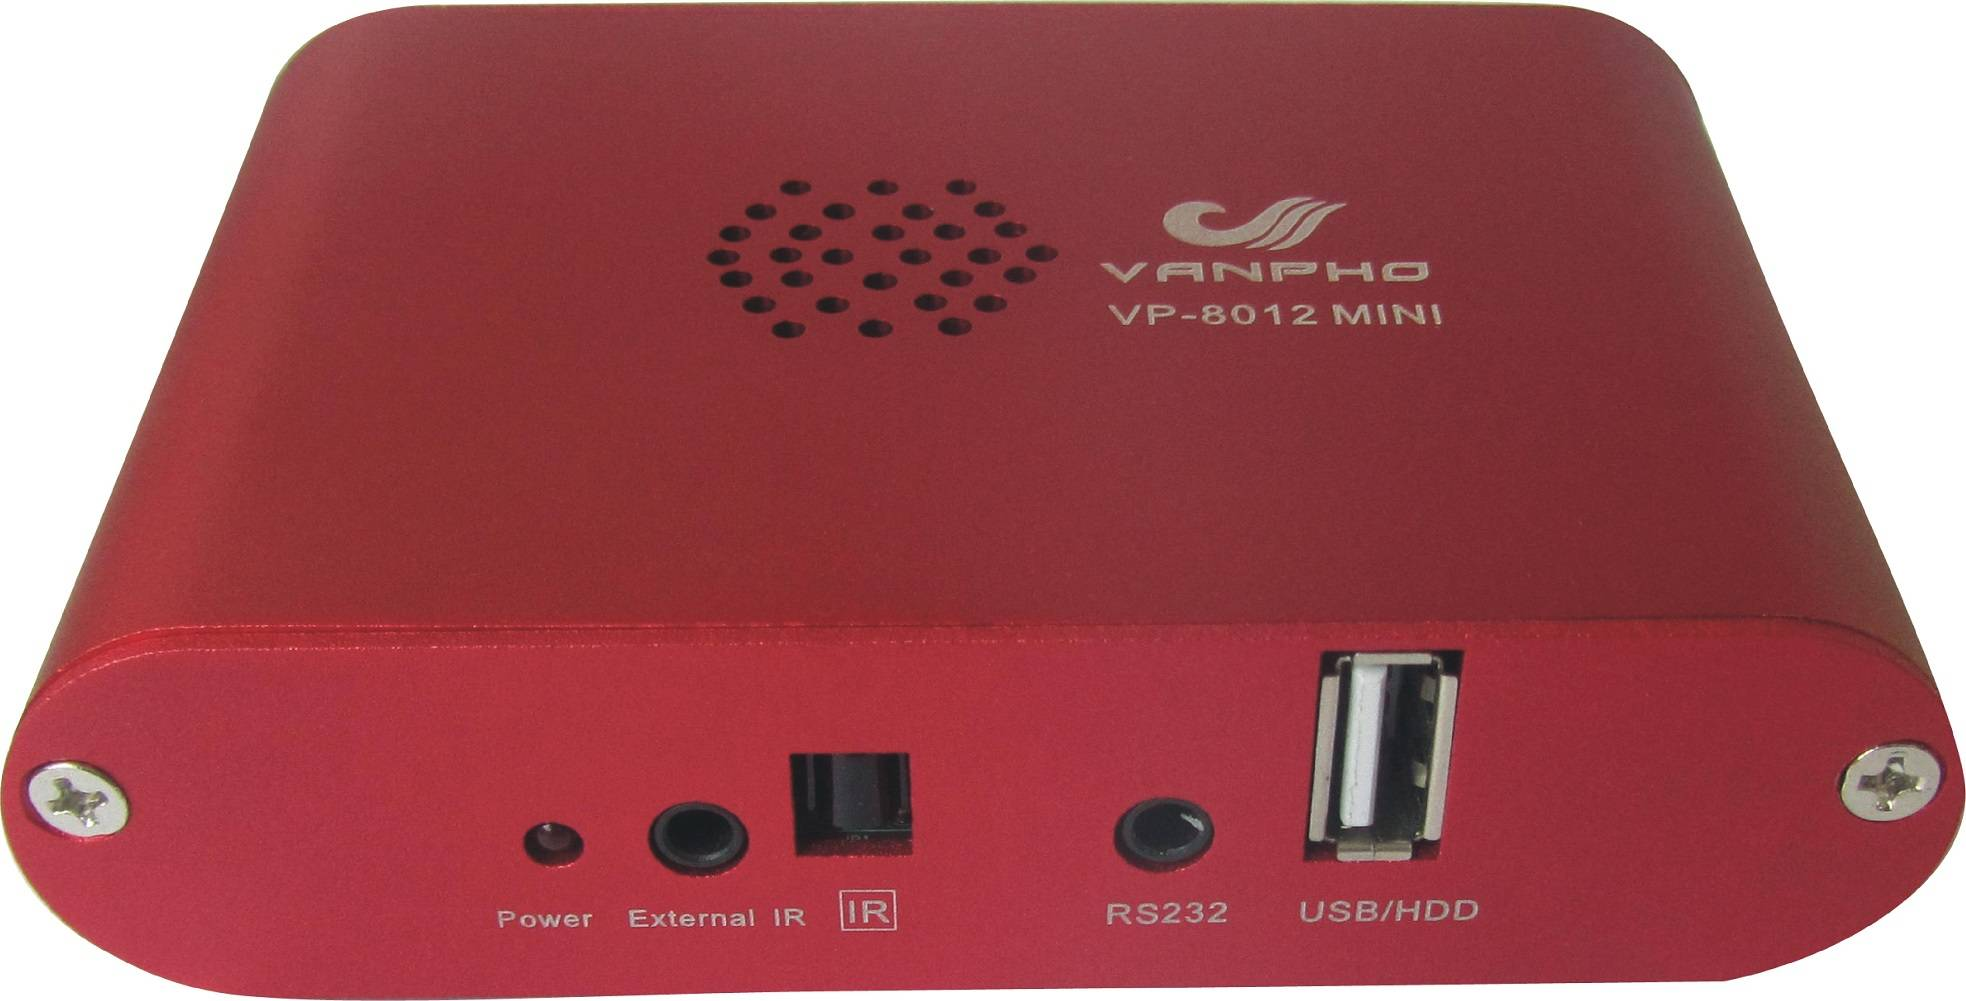 VP-S8012 MINI